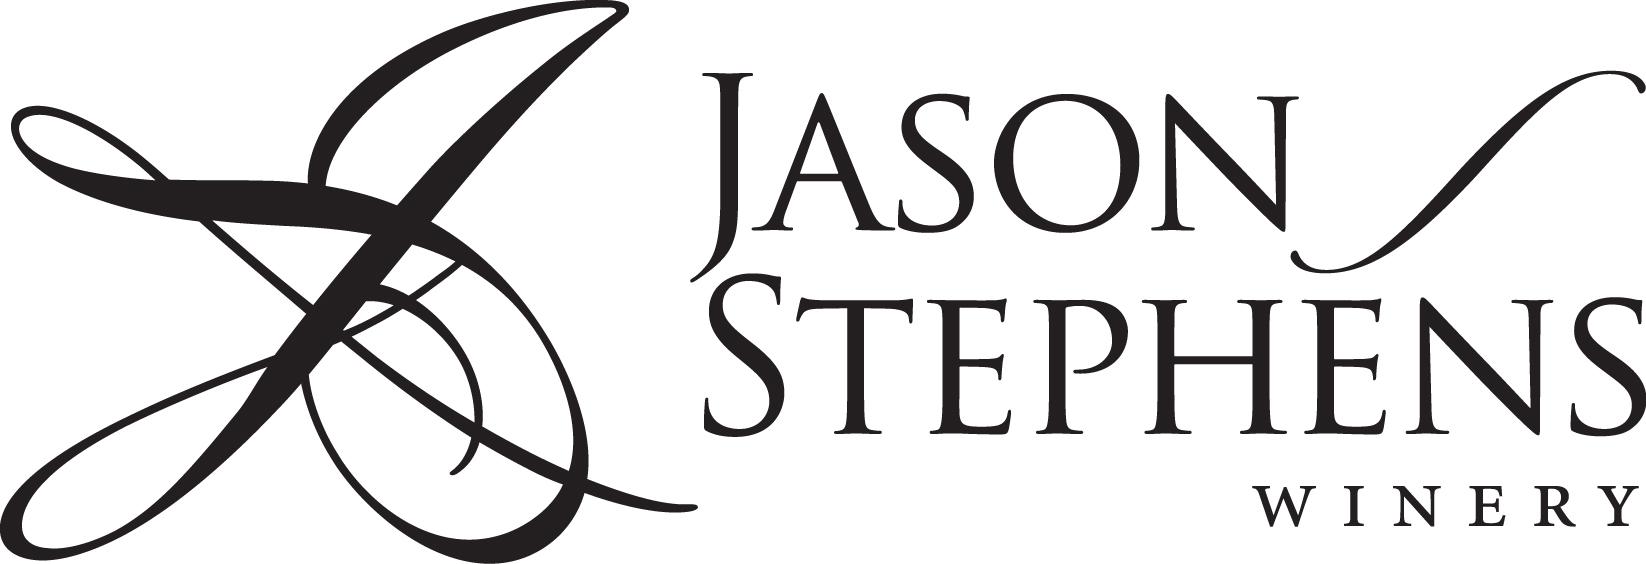 Jason Stephens Winery